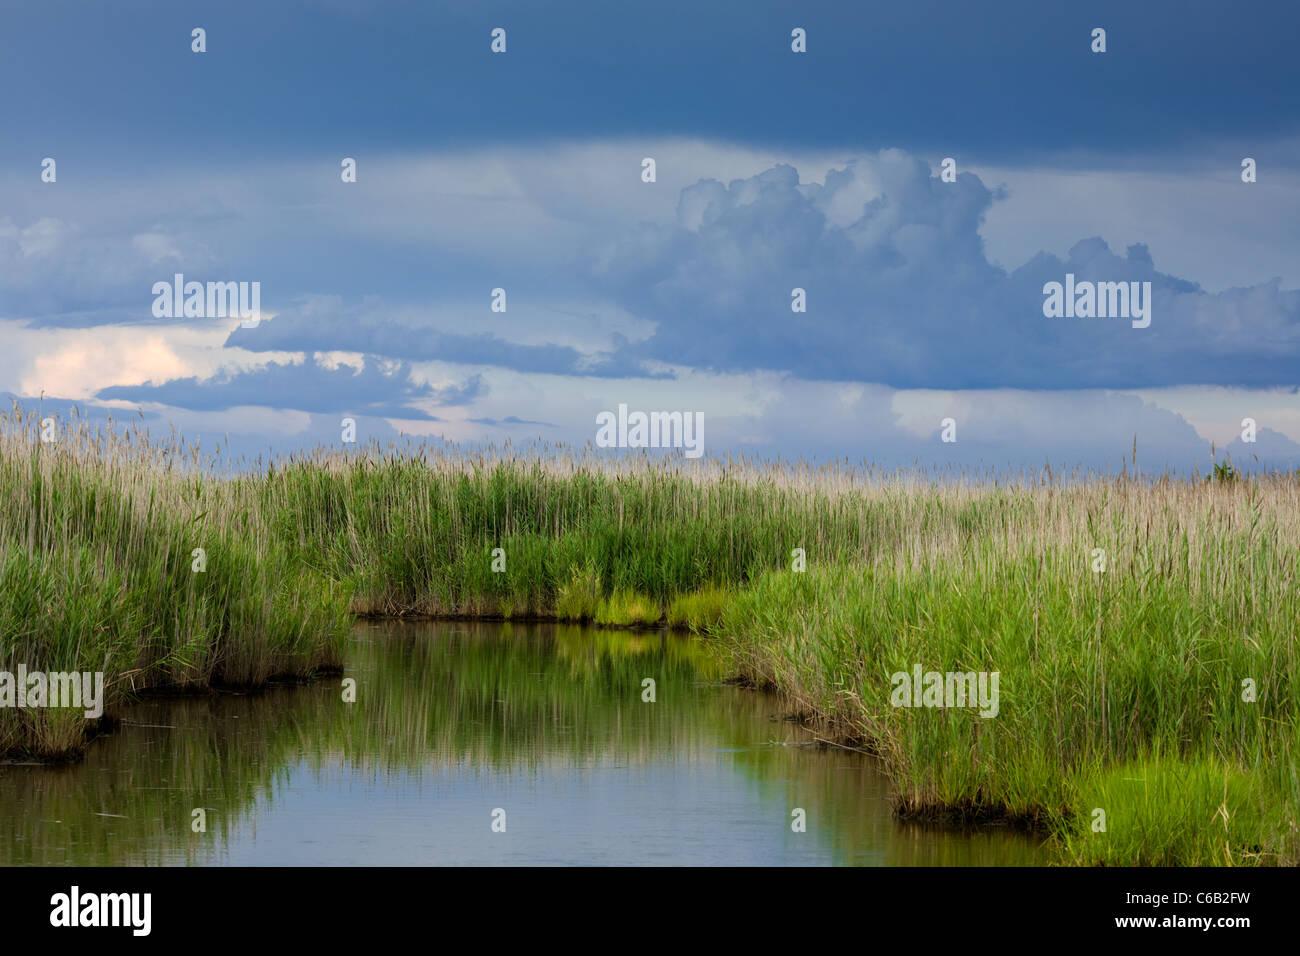 Fecund estuary in Bivalve, New Jersey - Stock Image